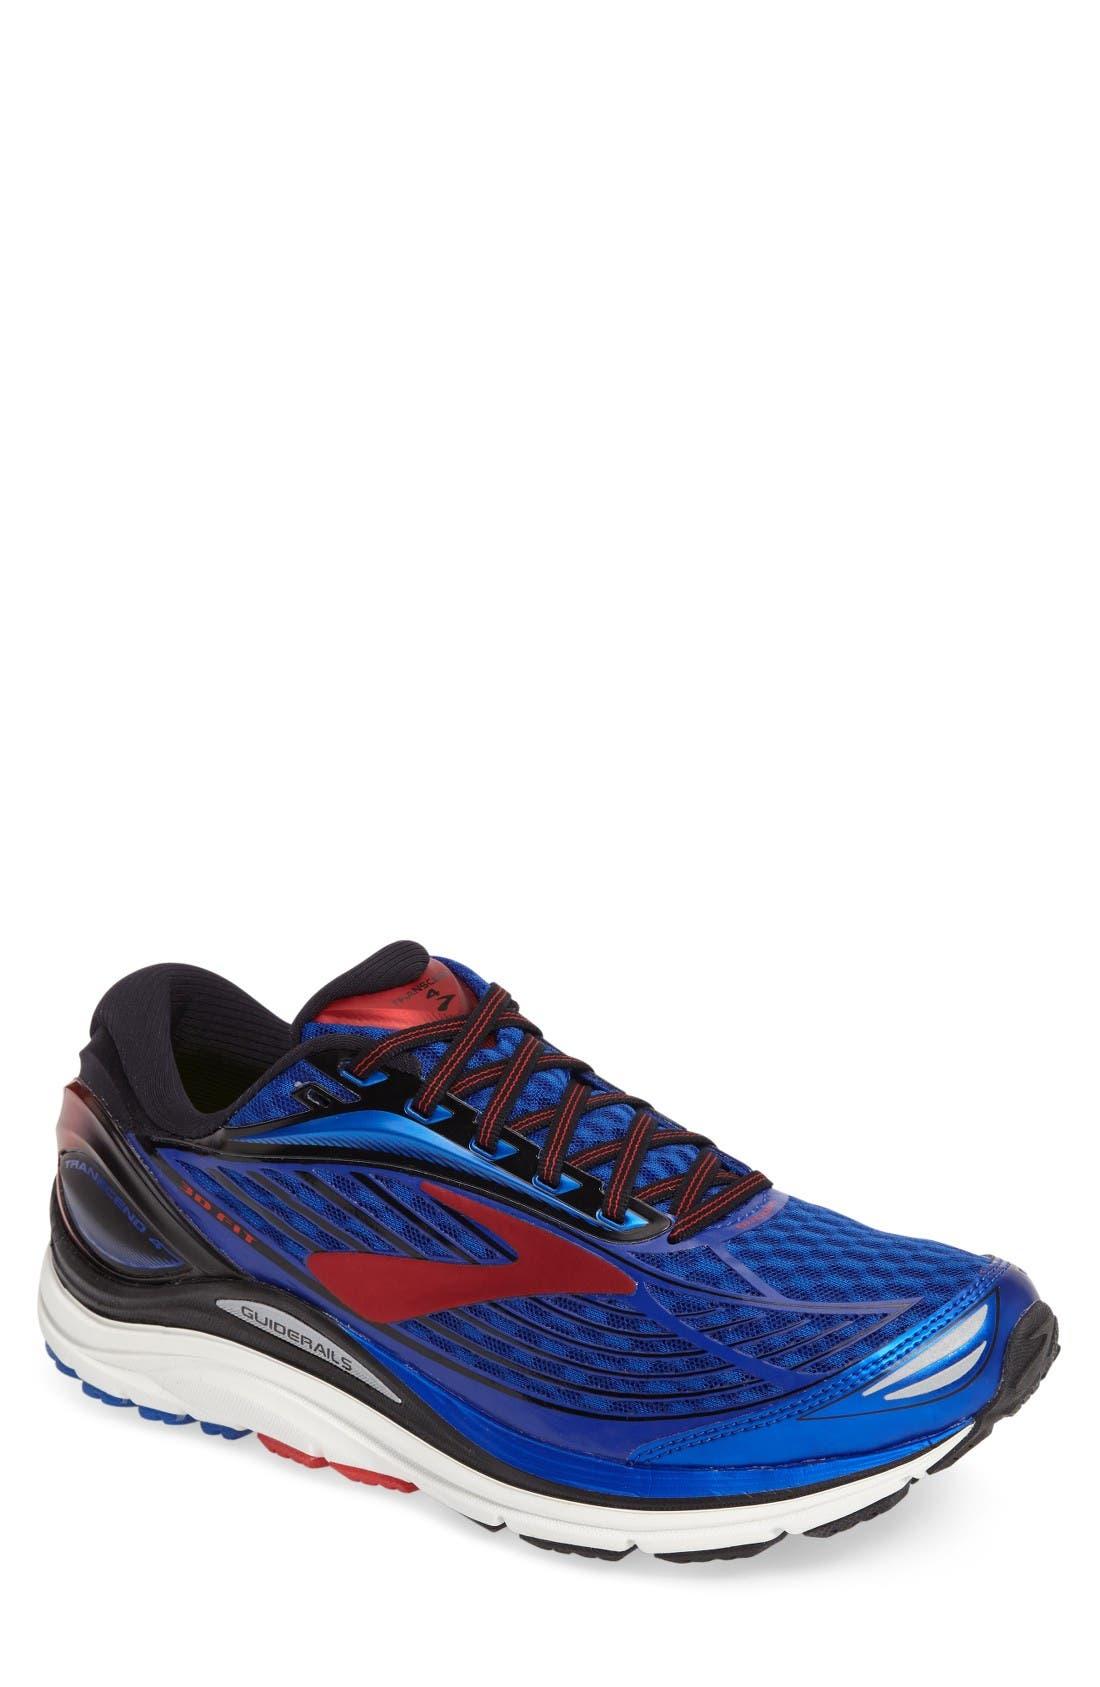 Transcend 4 Running Shoe,                             Main thumbnail 1, color,                             Blue/ Black/ Red